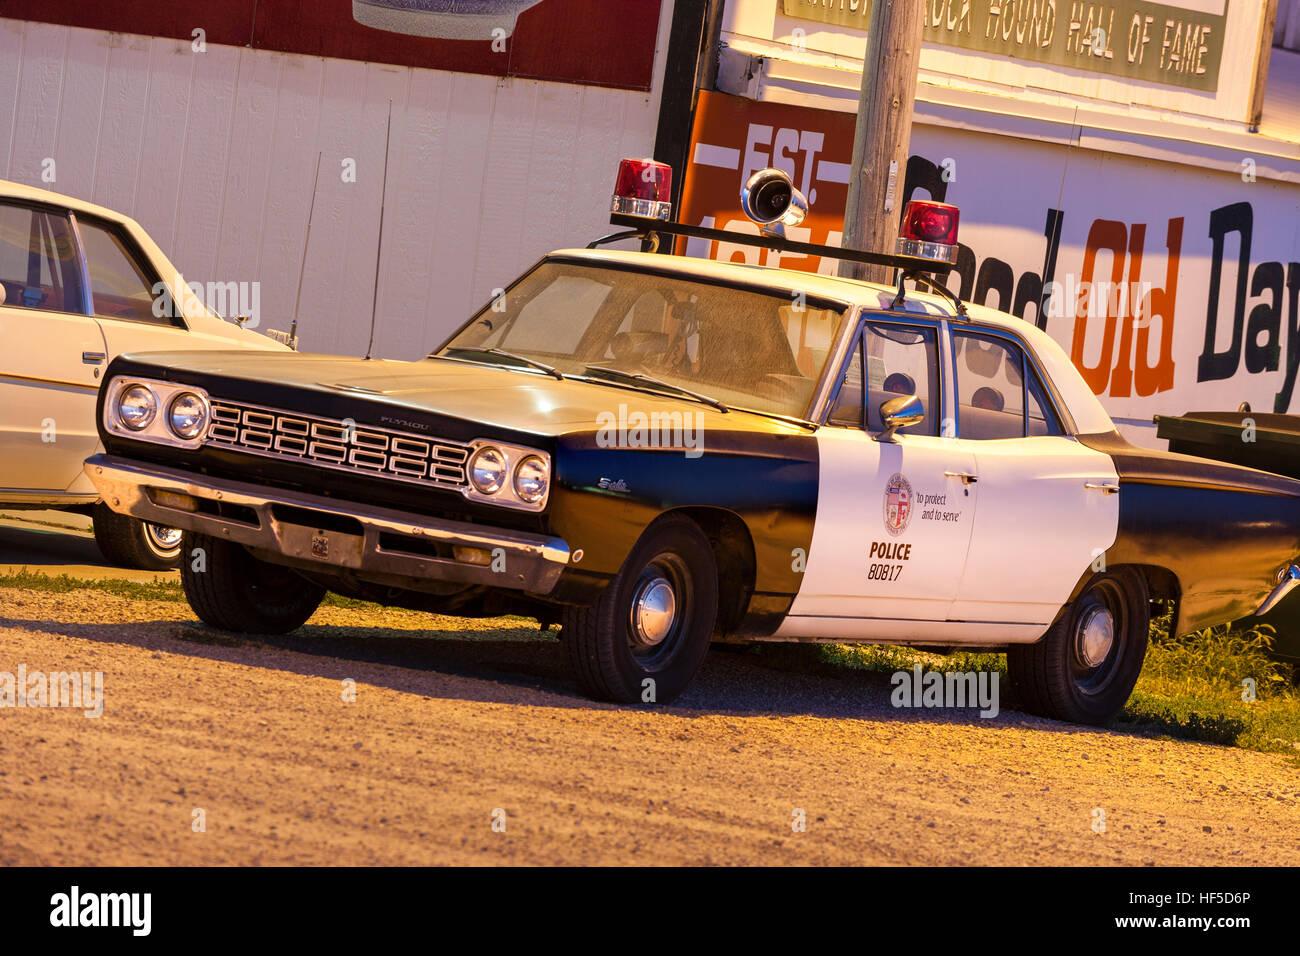 police car photos police car images alamy. Black Bedroom Furniture Sets. Home Design Ideas